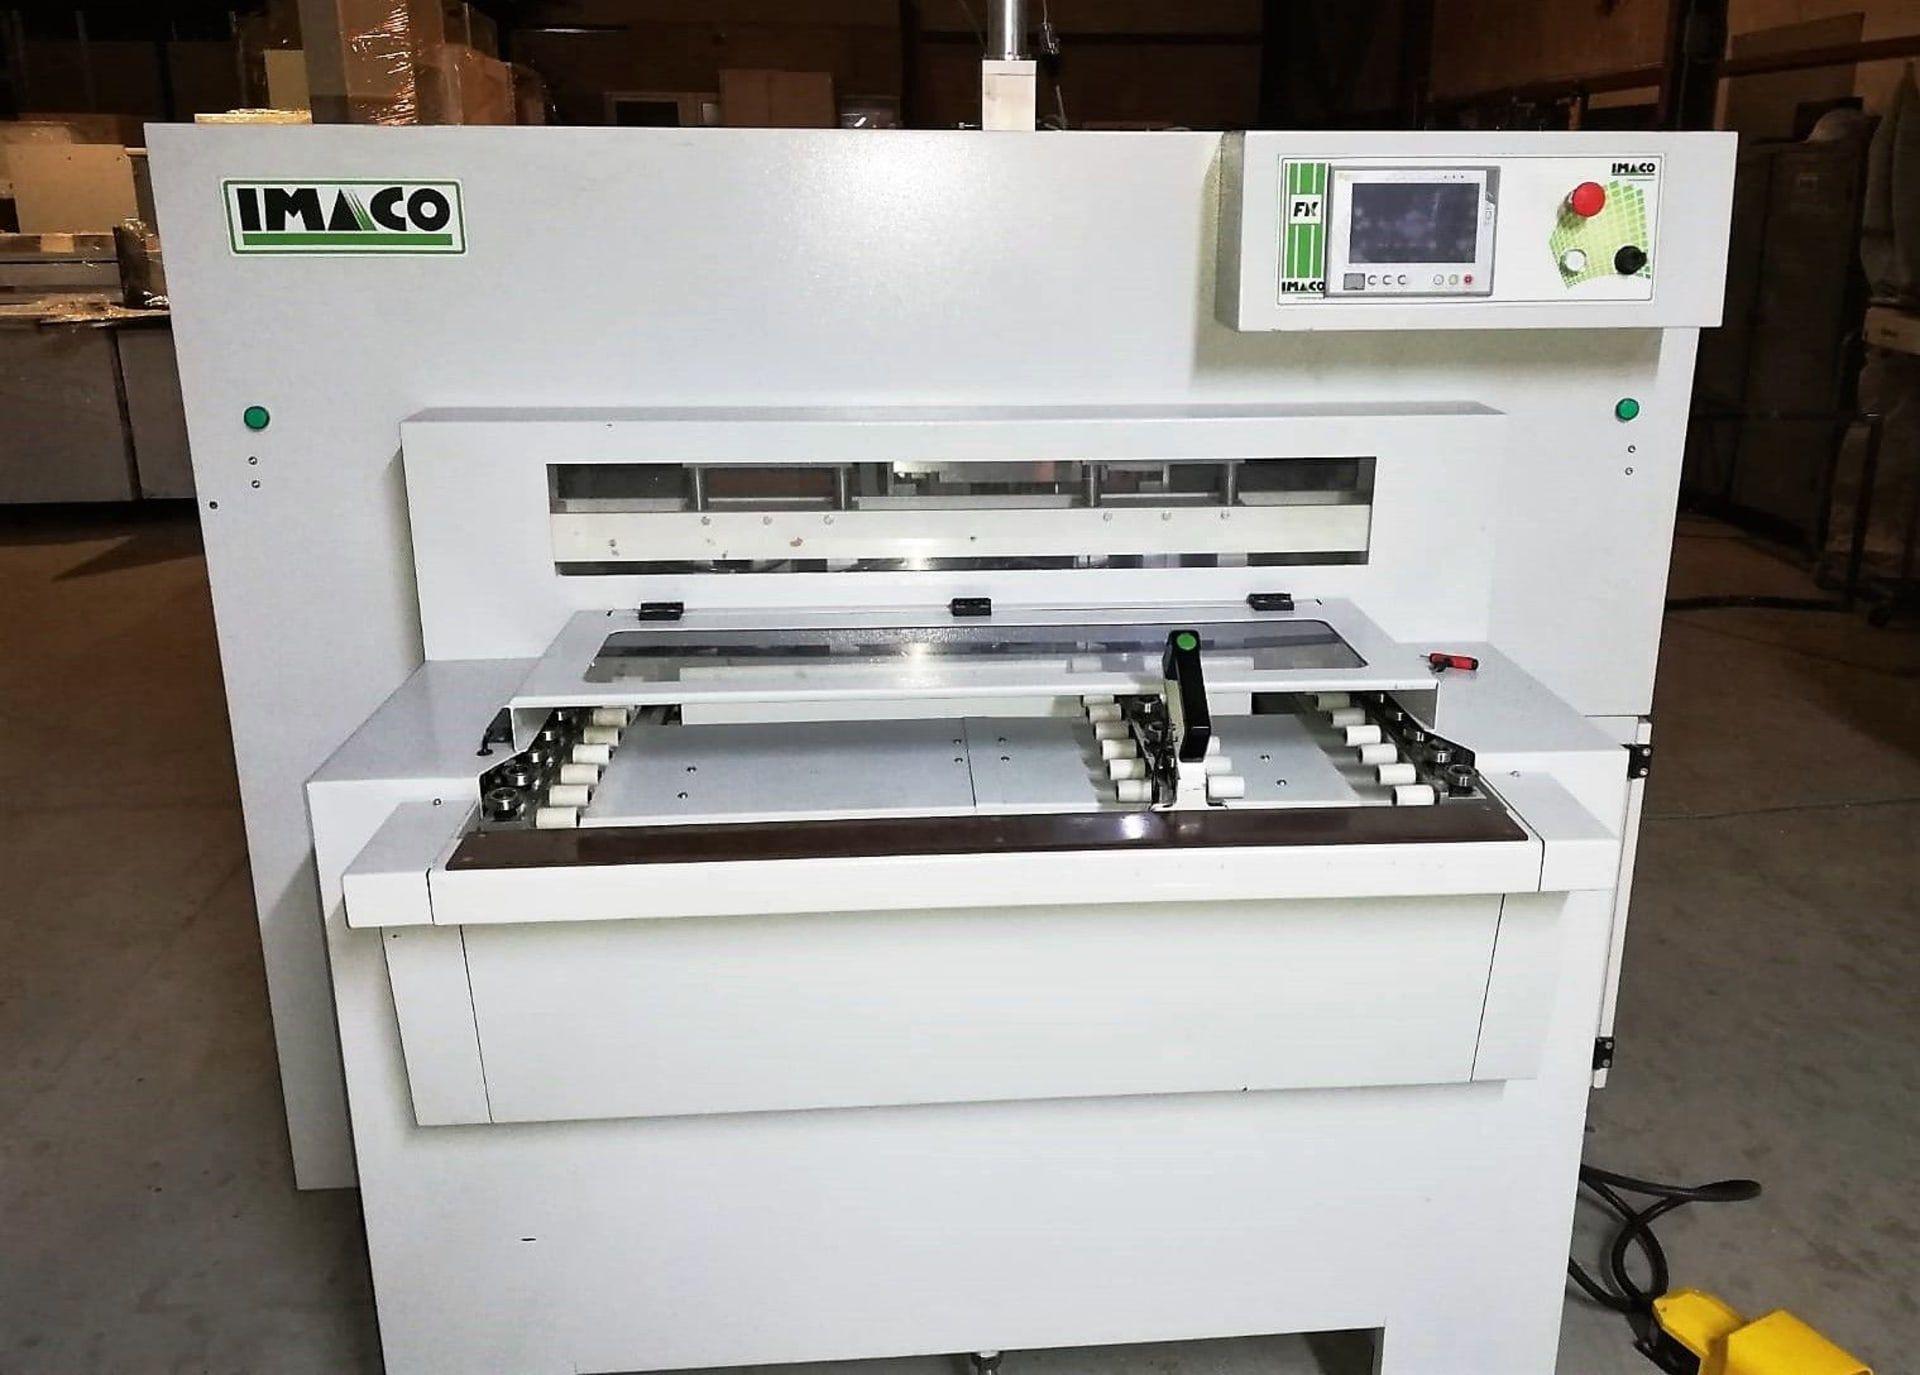 IMACO HIRTZ FK 800L CNC-Bohrmaschine